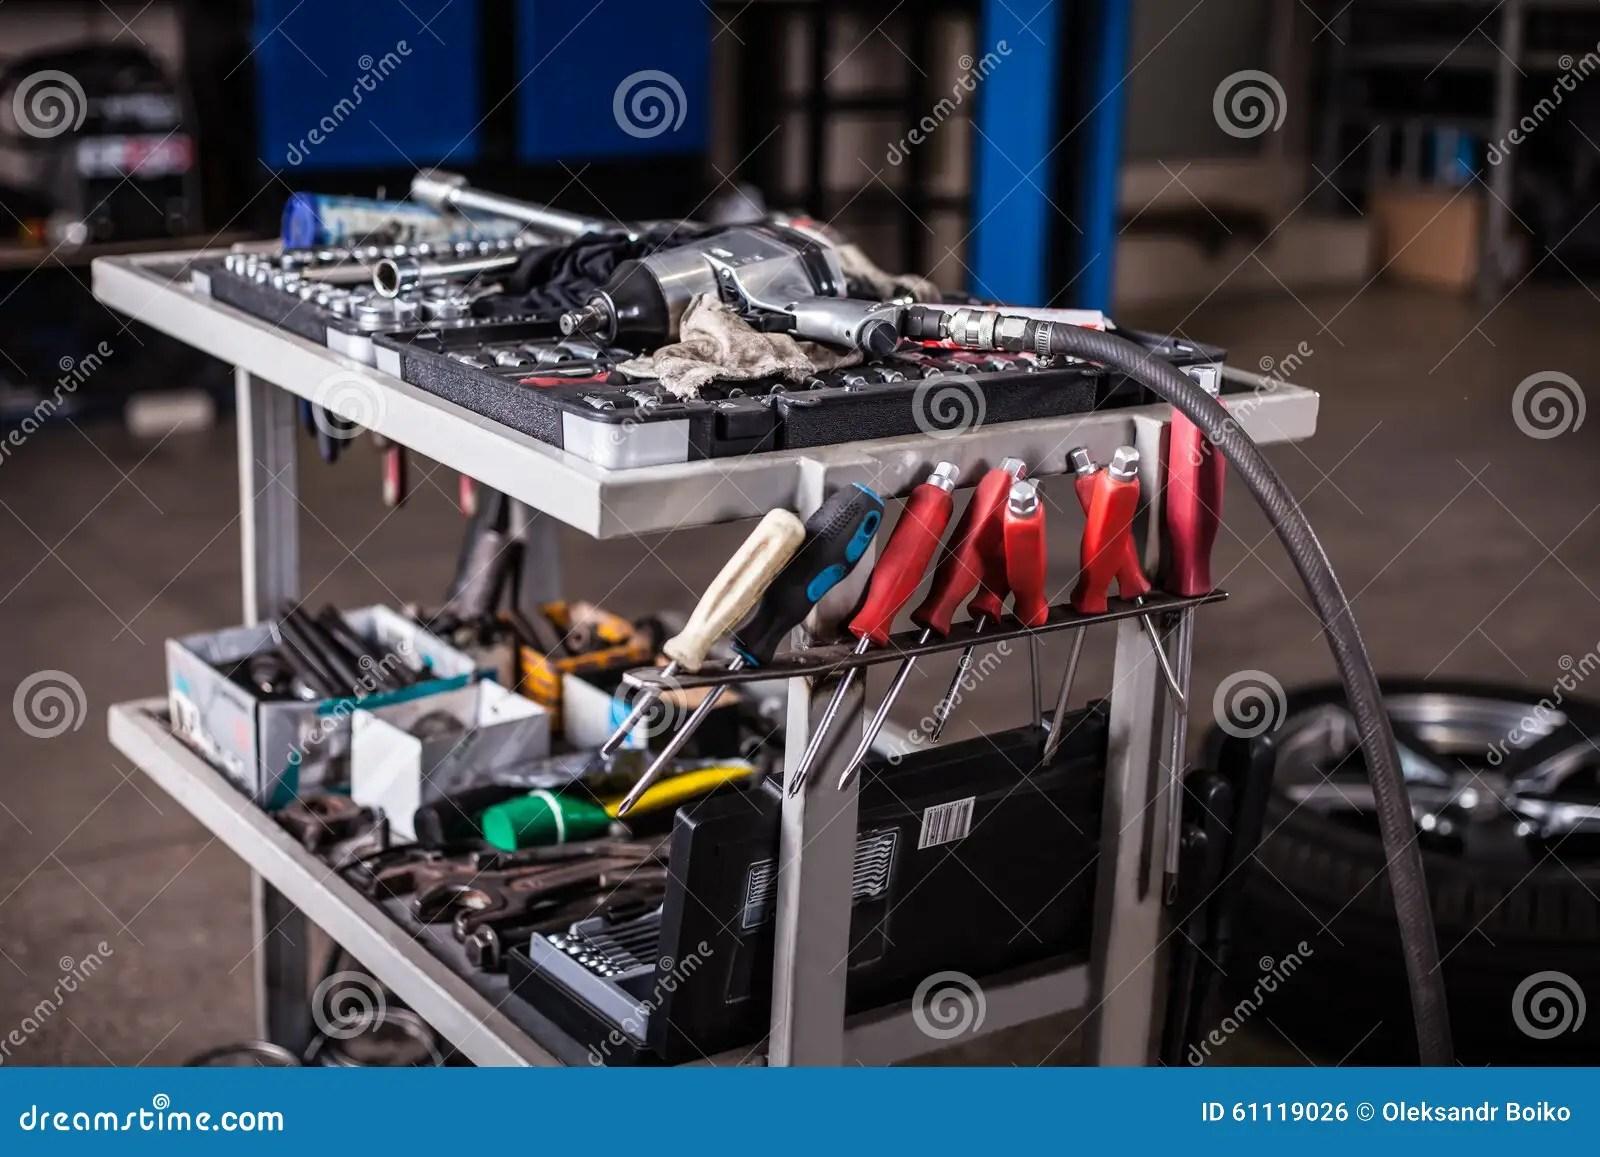 Tools In Mechanic Garage Stock Photo Image 61119026